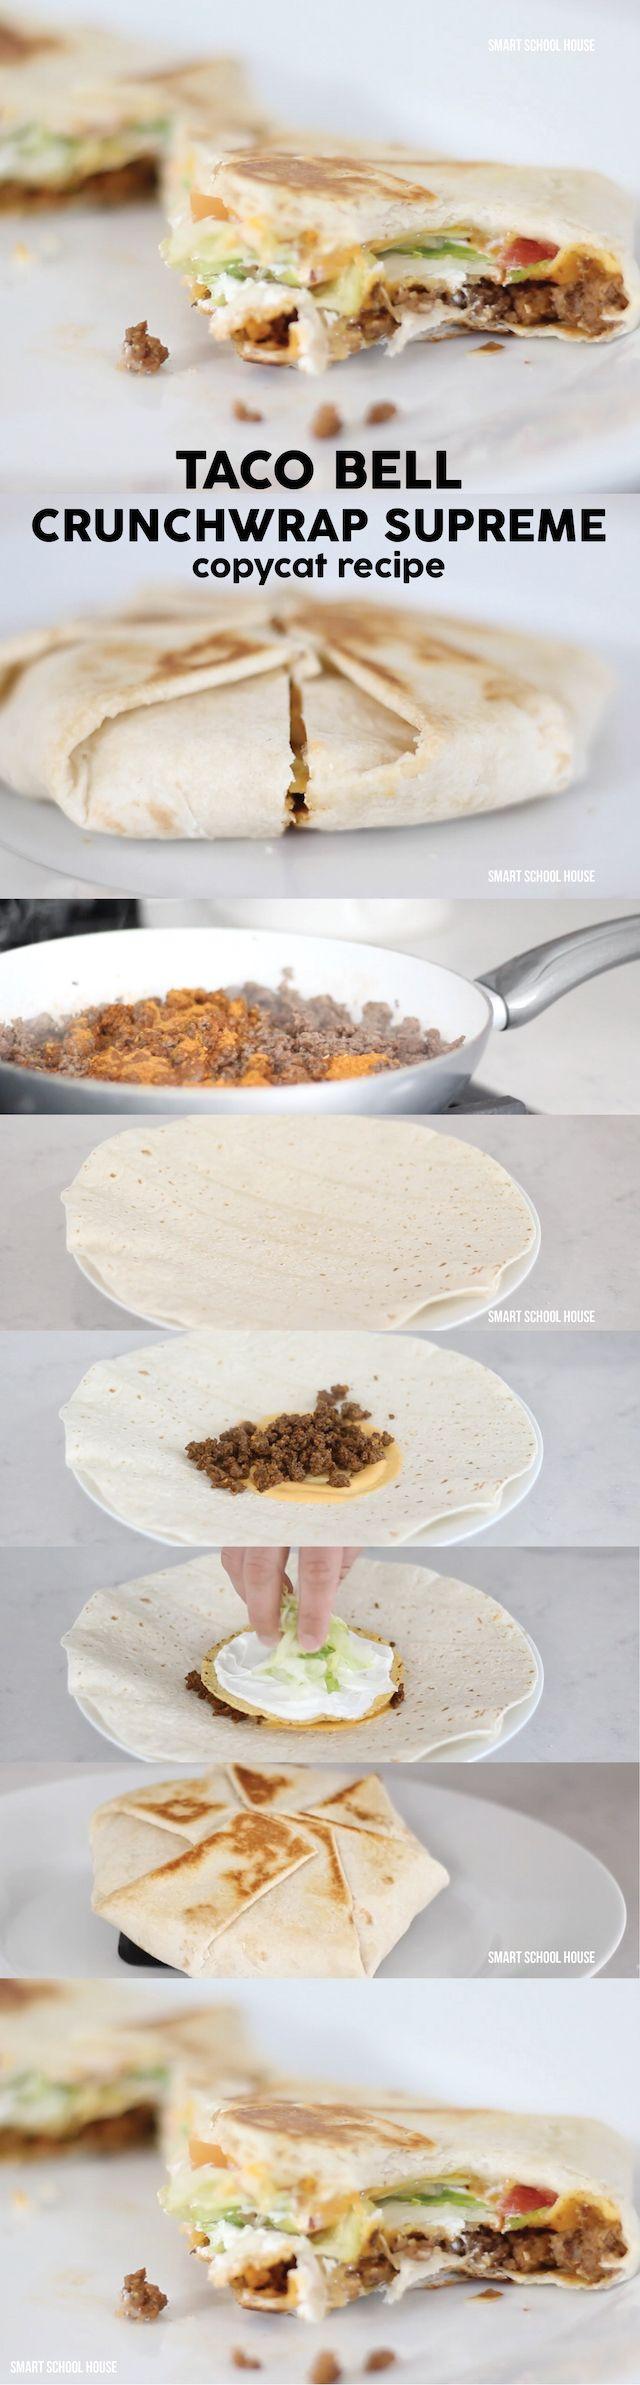 DIY Taco Bell Crunchwrap Supreme copycat recipe to make a home. Saving this!: